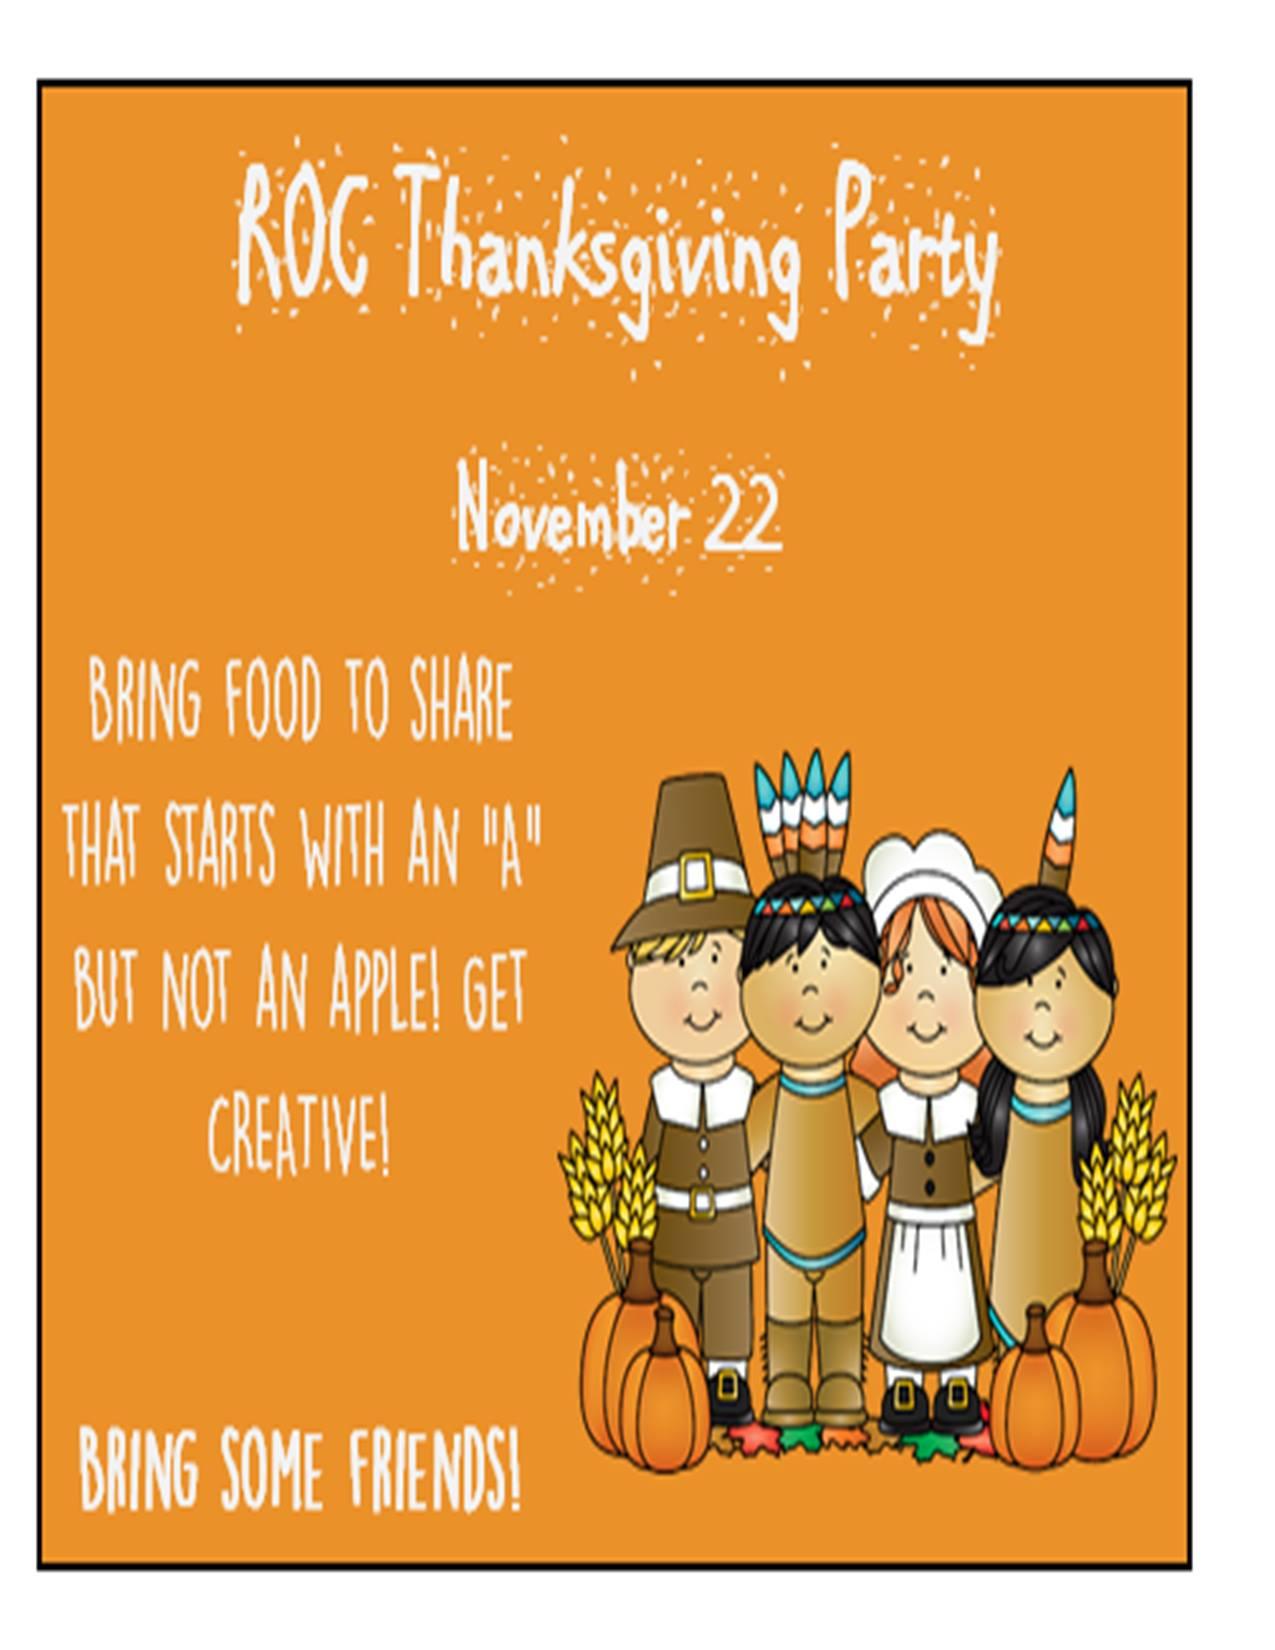 ROC Thanksgiving